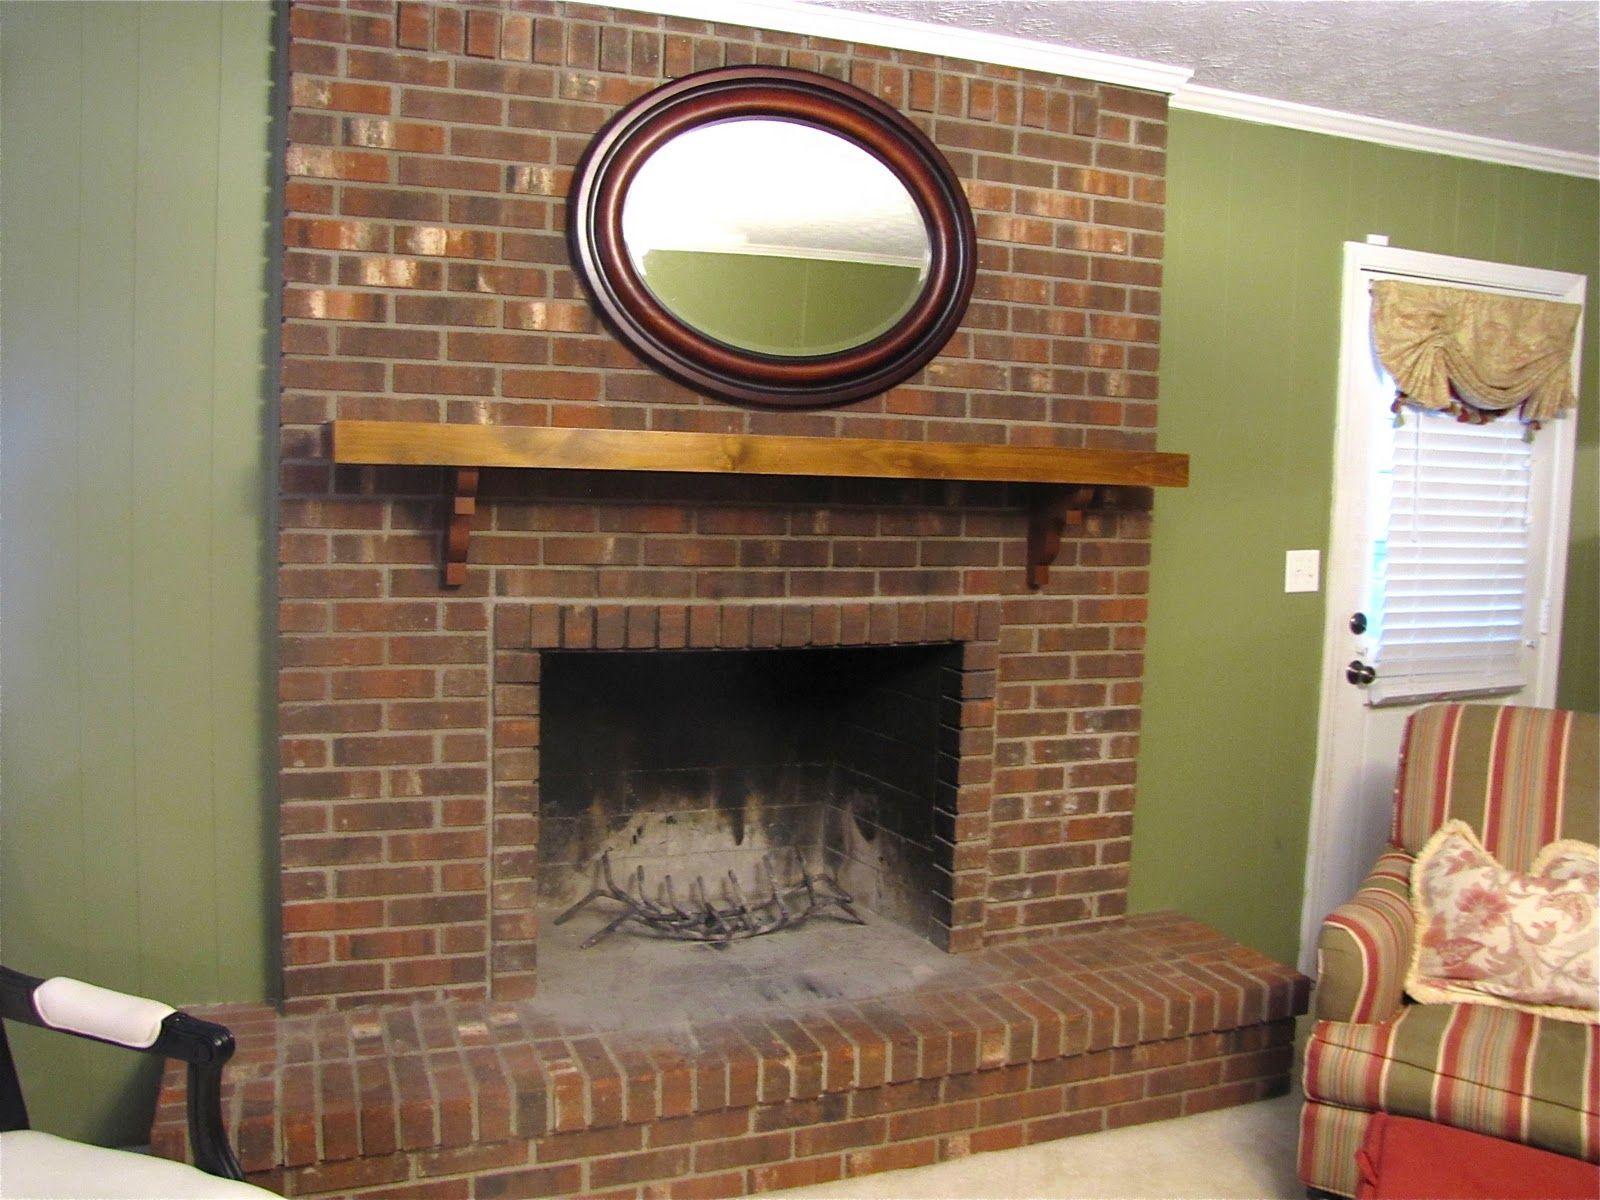 Brick fireplace mantel makeover fireplaces pinterest brick